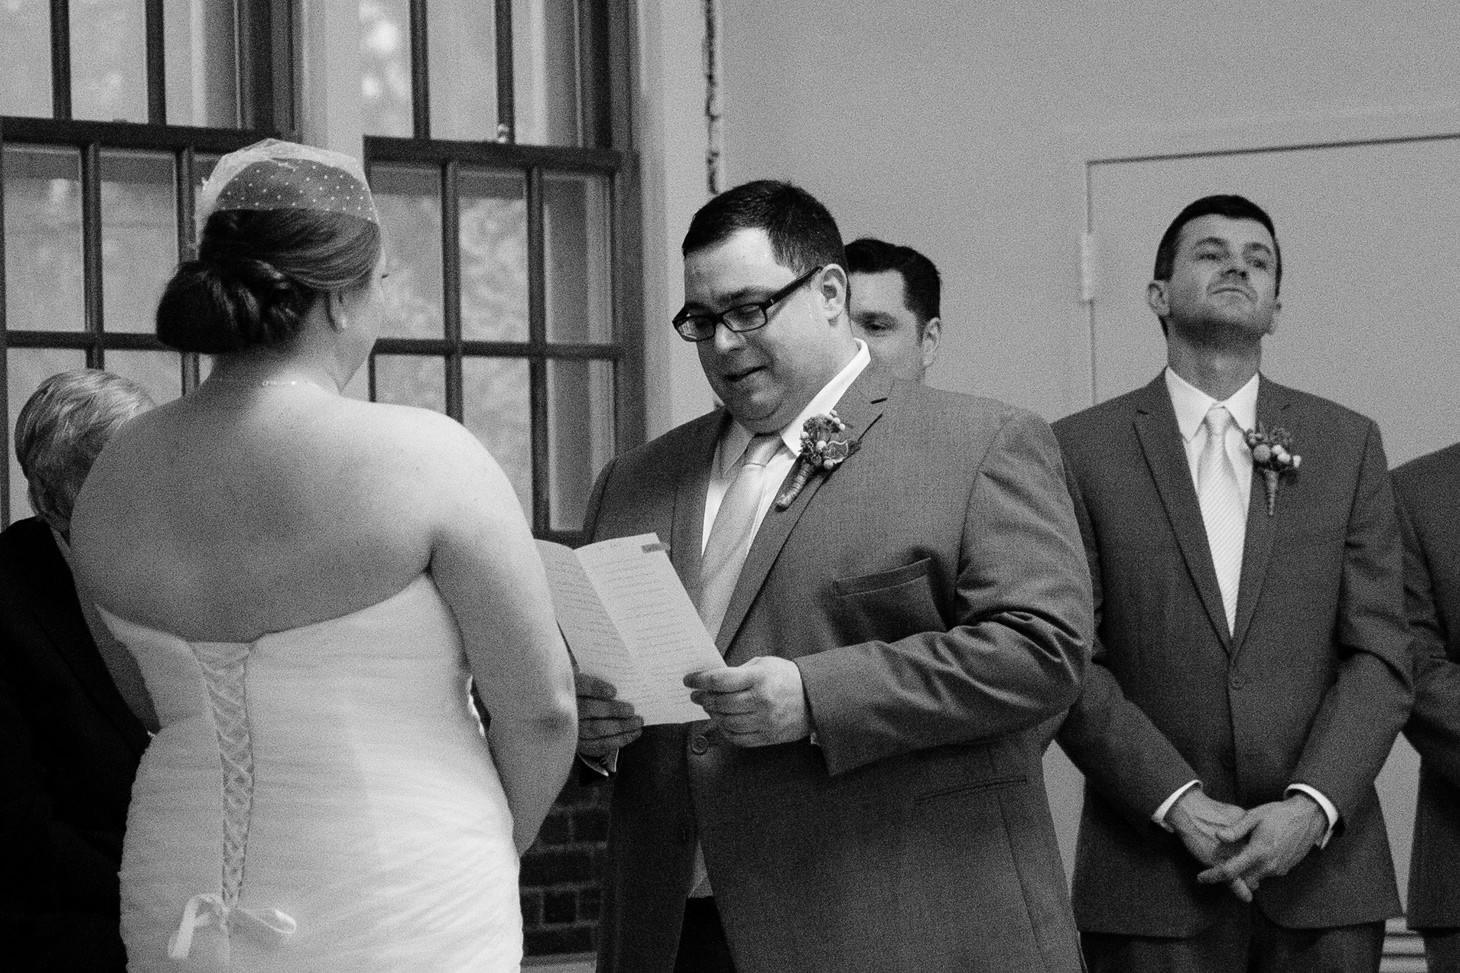 nyc-brooklyn-prospect-park-picnic-house-wedding-smitten-chickens-nerdy-35.jpg